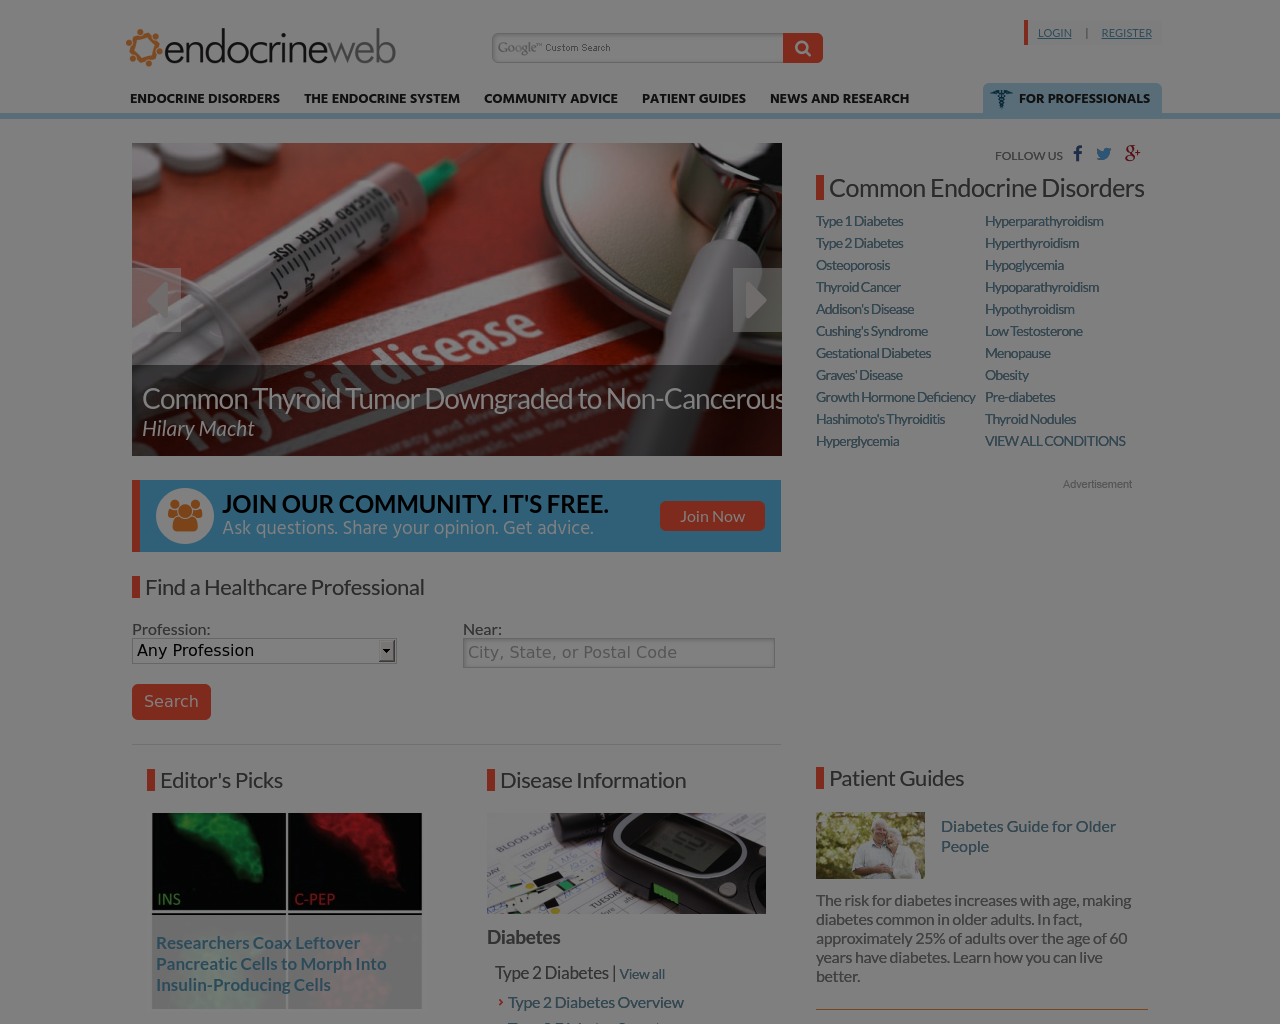 endocrineweb-Advertising-Reviews-Pricing